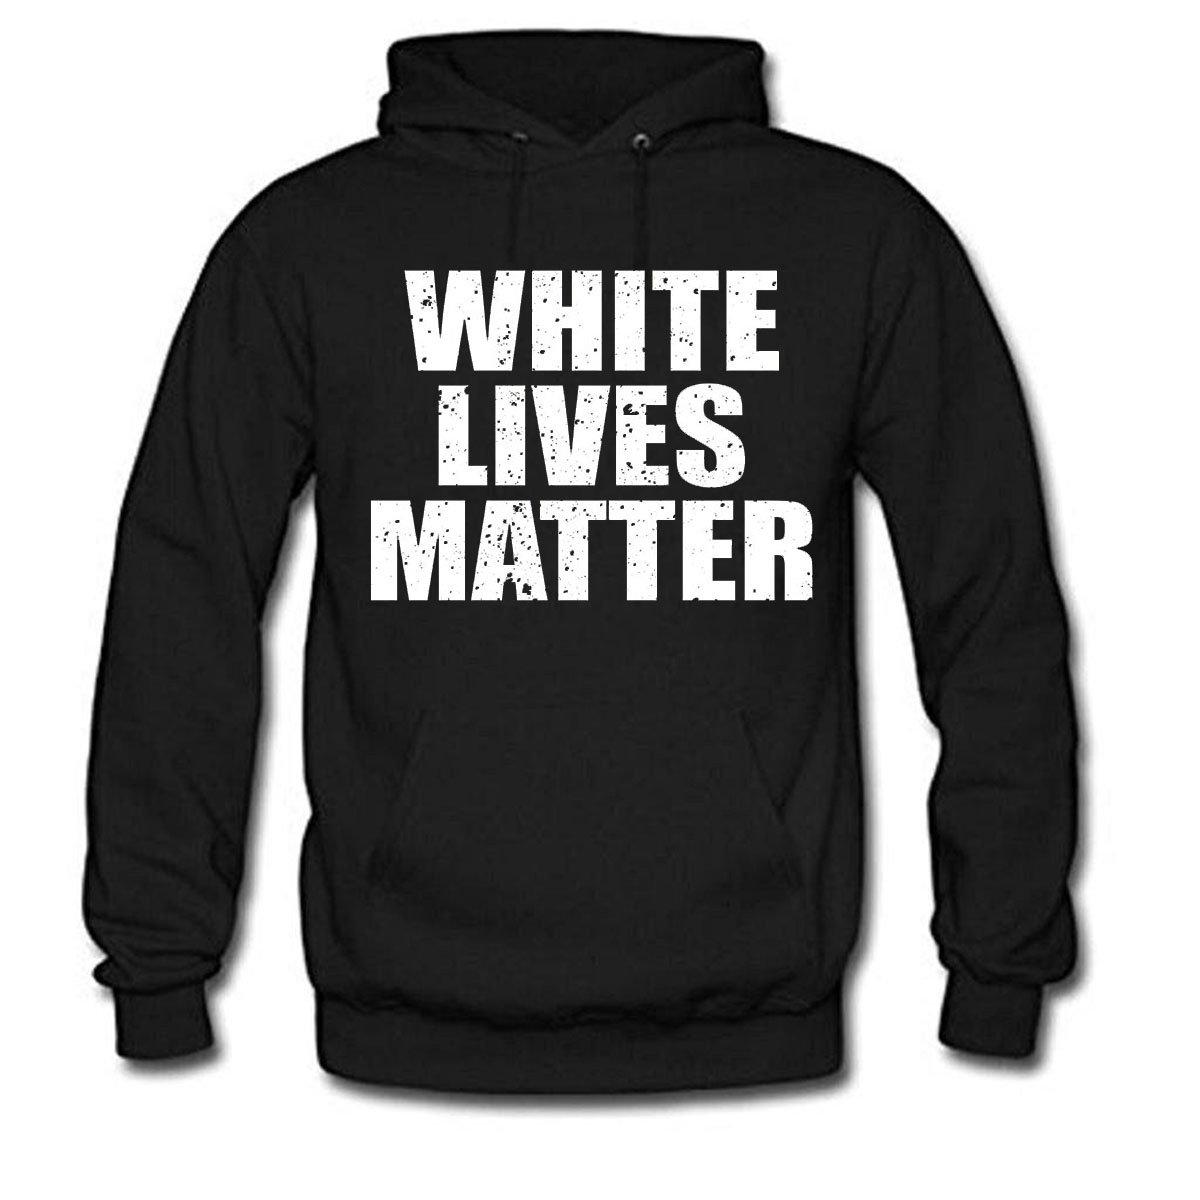 aac27d4dcdd White lives matter men long sleeve cotton hoodie at amazon men clothing  store jpg 1200x1200 Matter